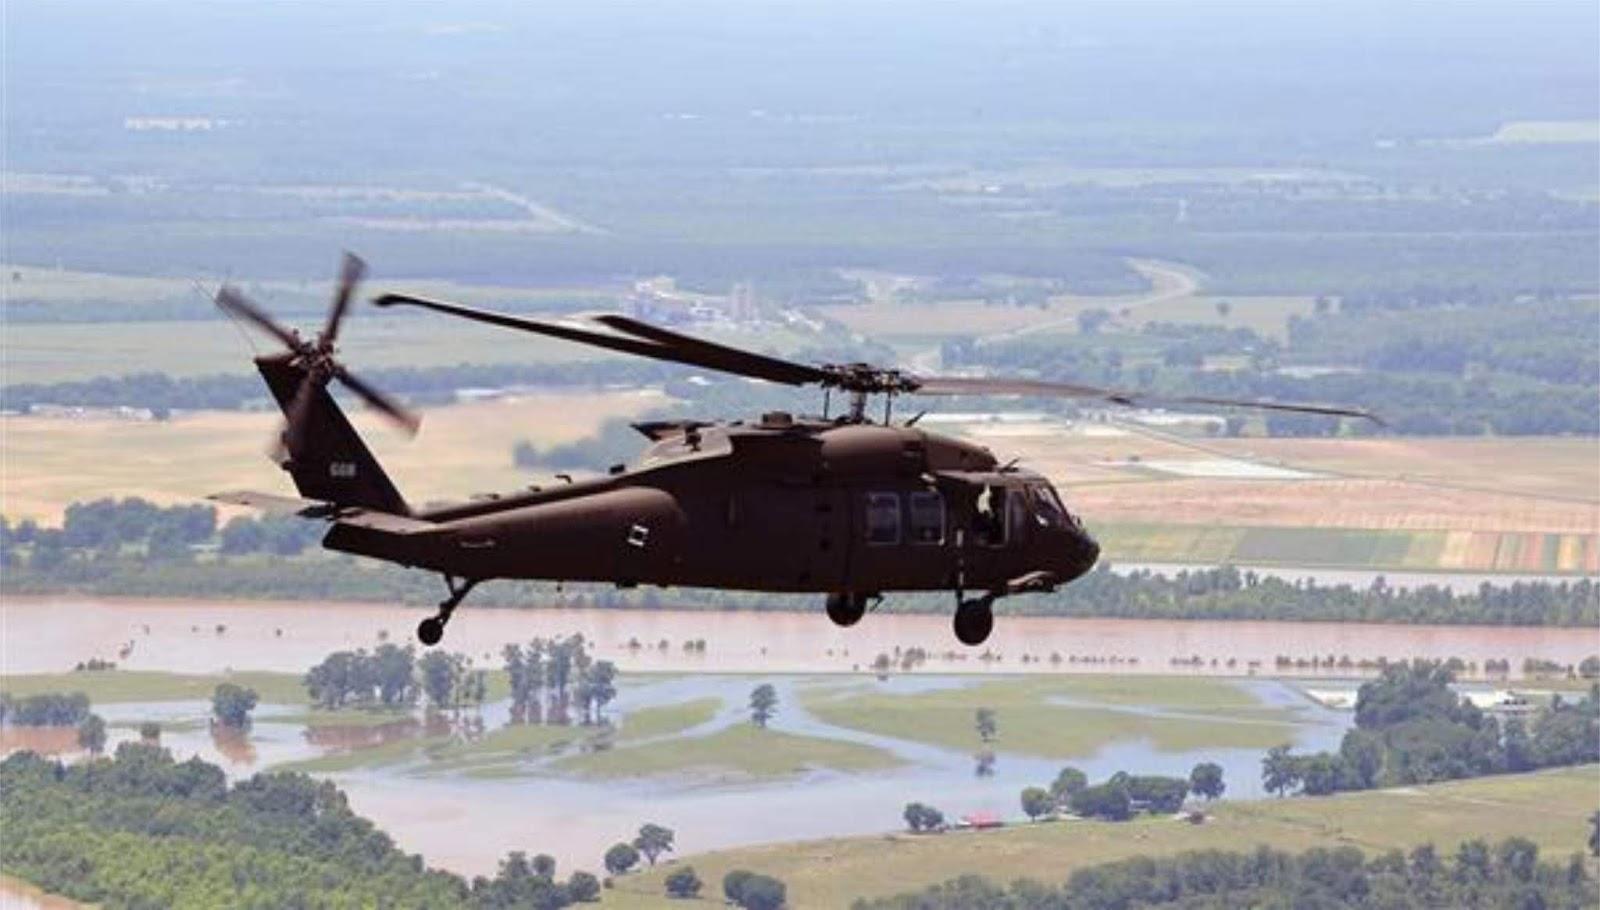 Kementerian Luar Negeri AS menyetujui penjualan helikopter Black Hawk ke Latvia